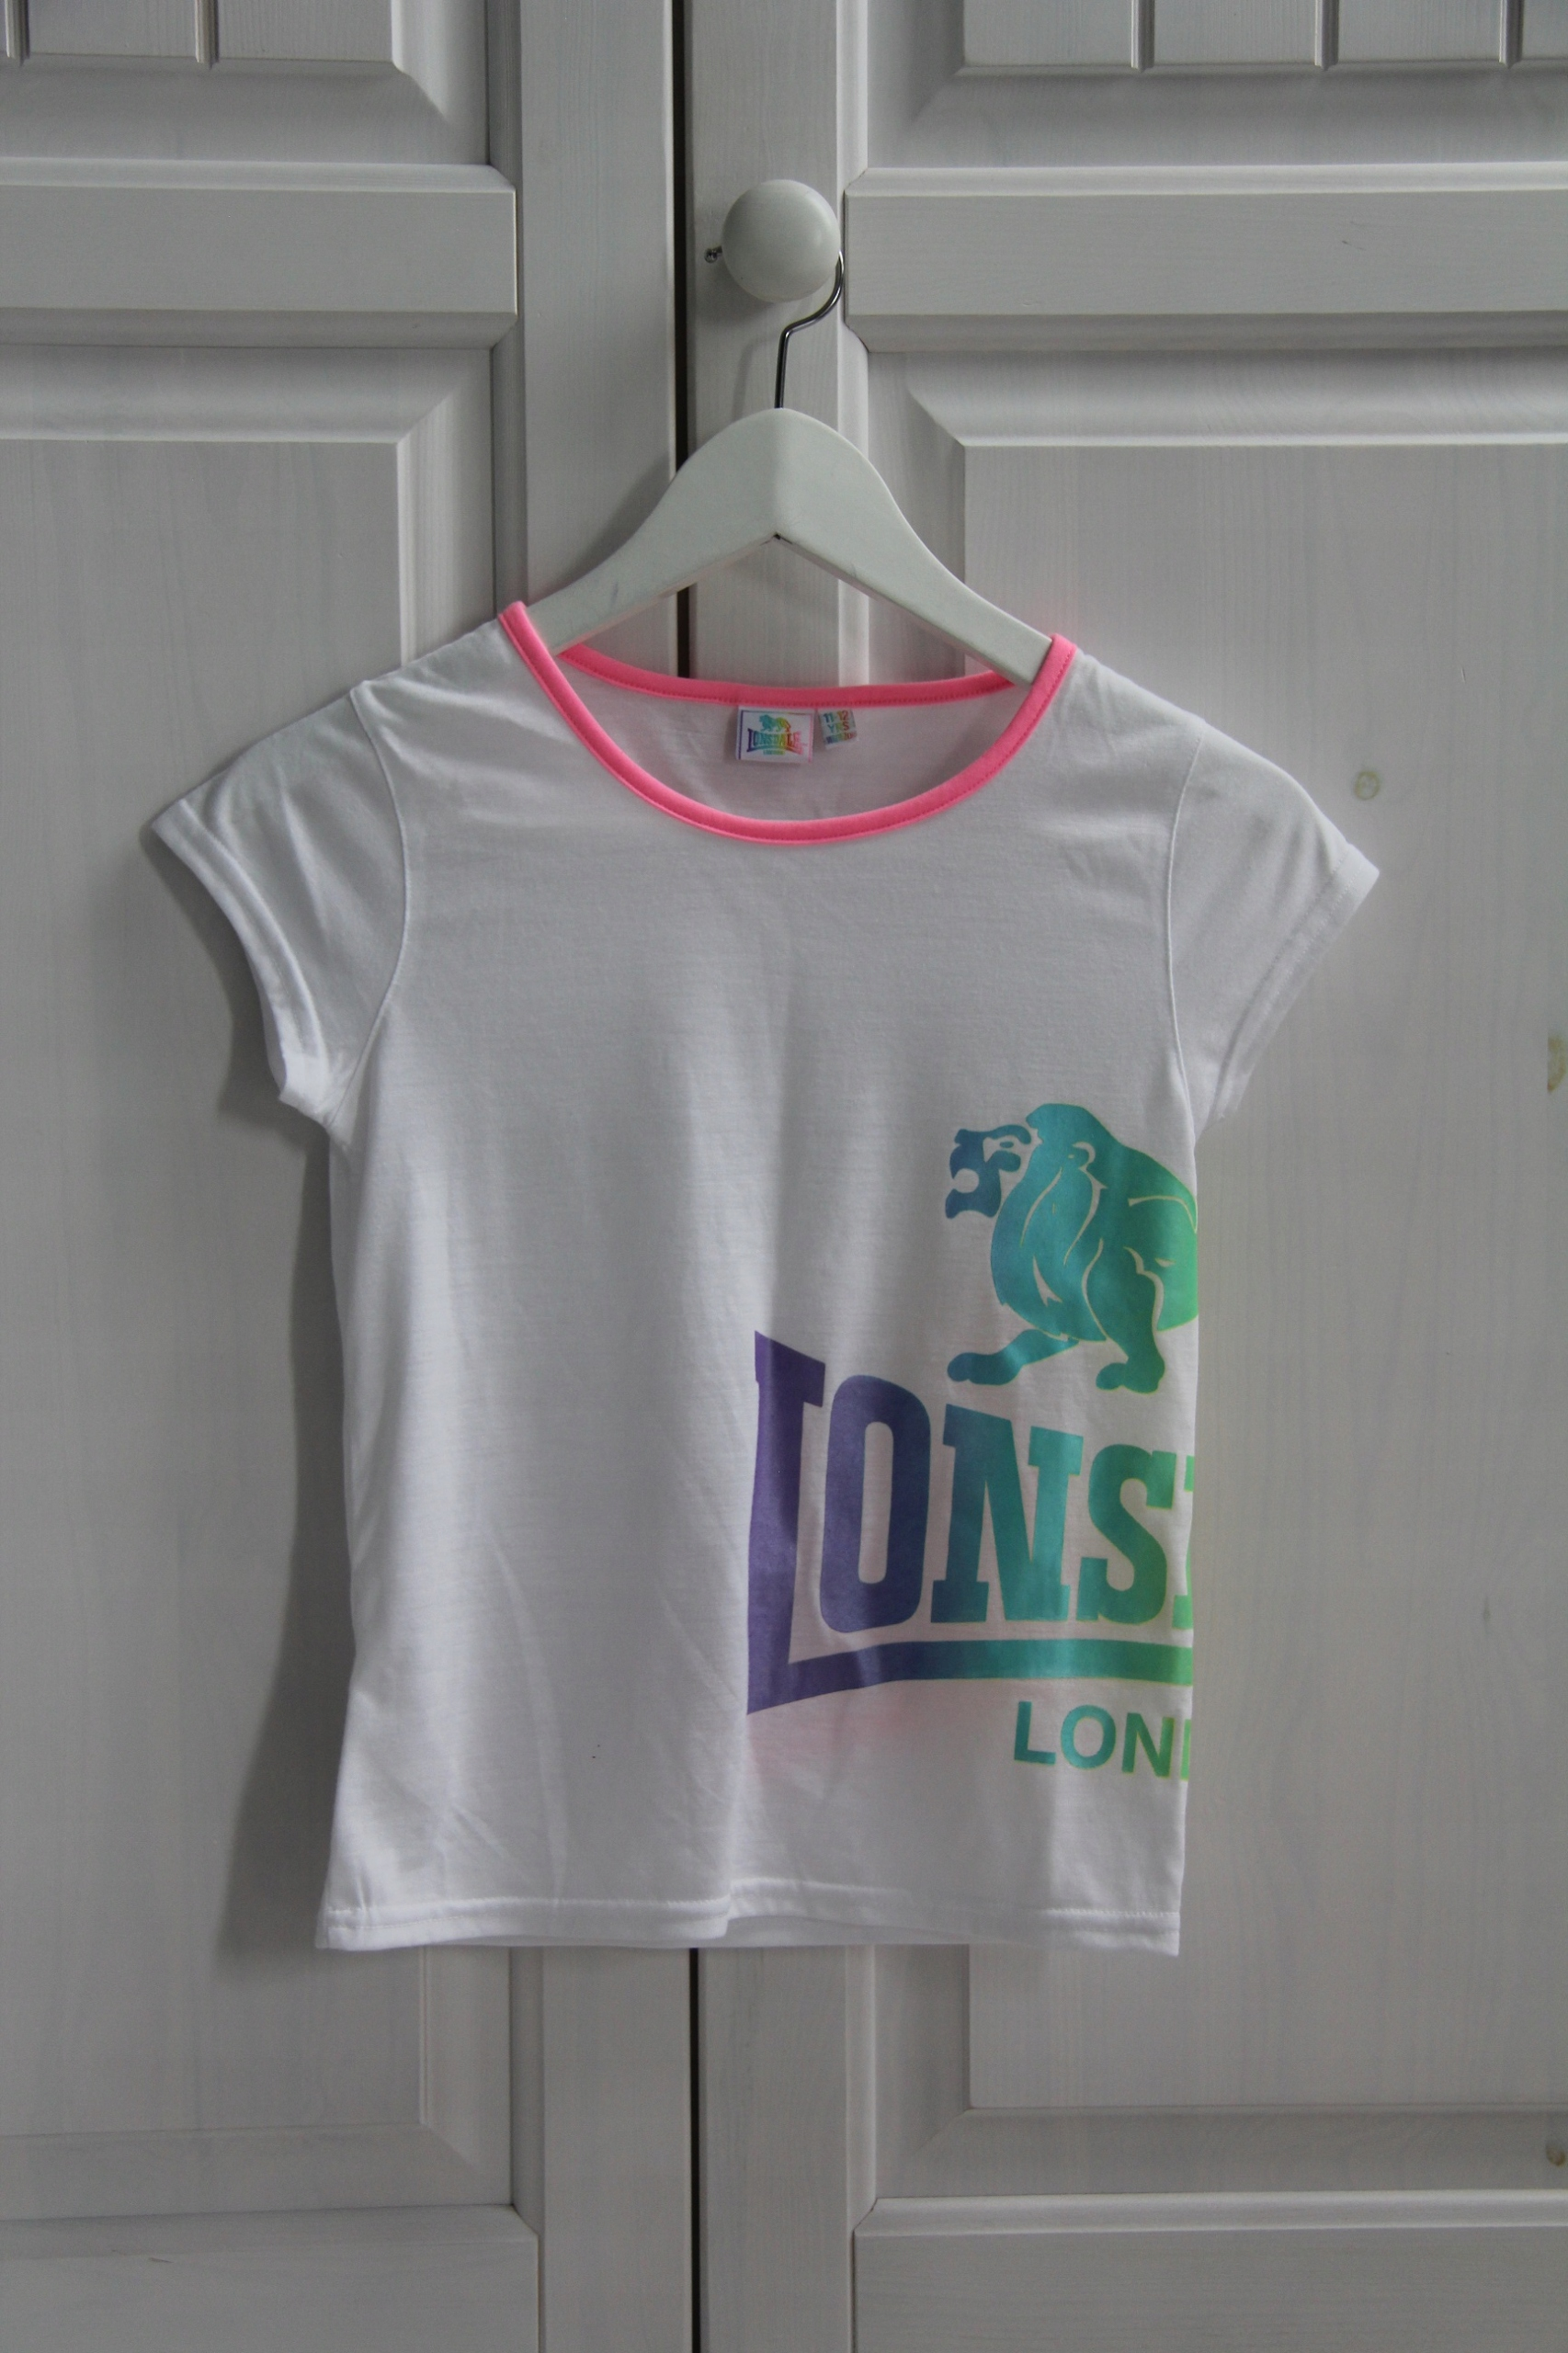 LONSDALE LONDON t-shirt11-12 LAT 146 CM